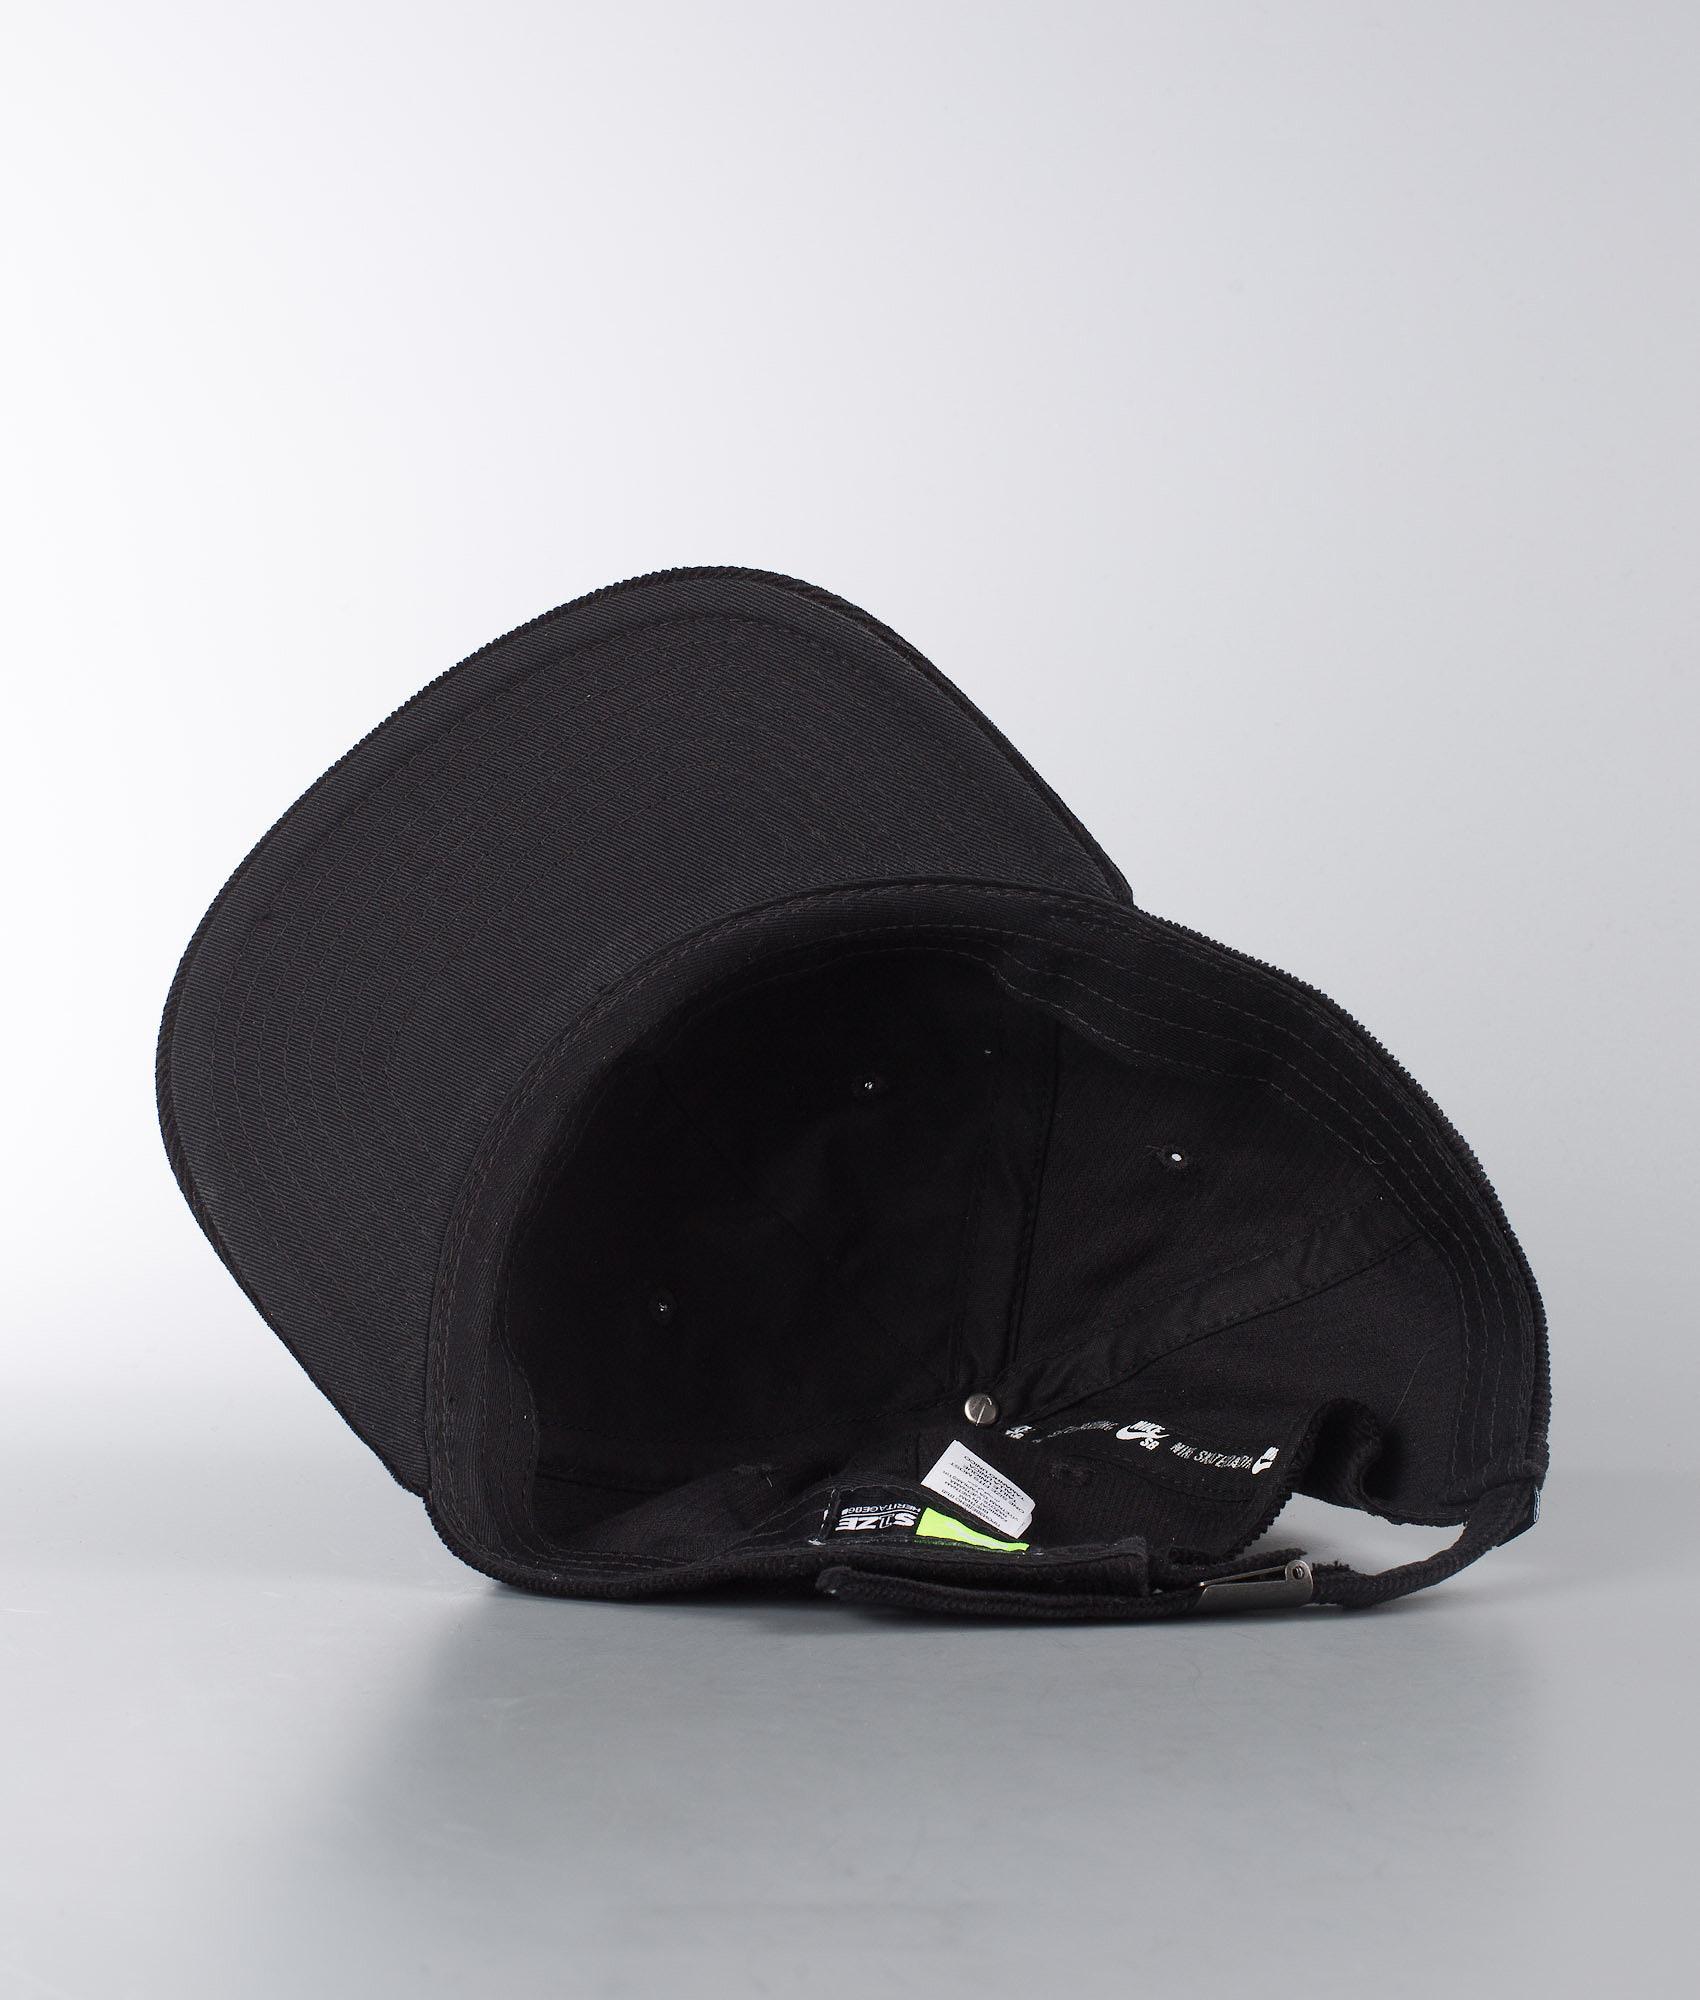 870c565b Nike Heritage 86 Flatbill Cap Black/Black - Ridestore.com